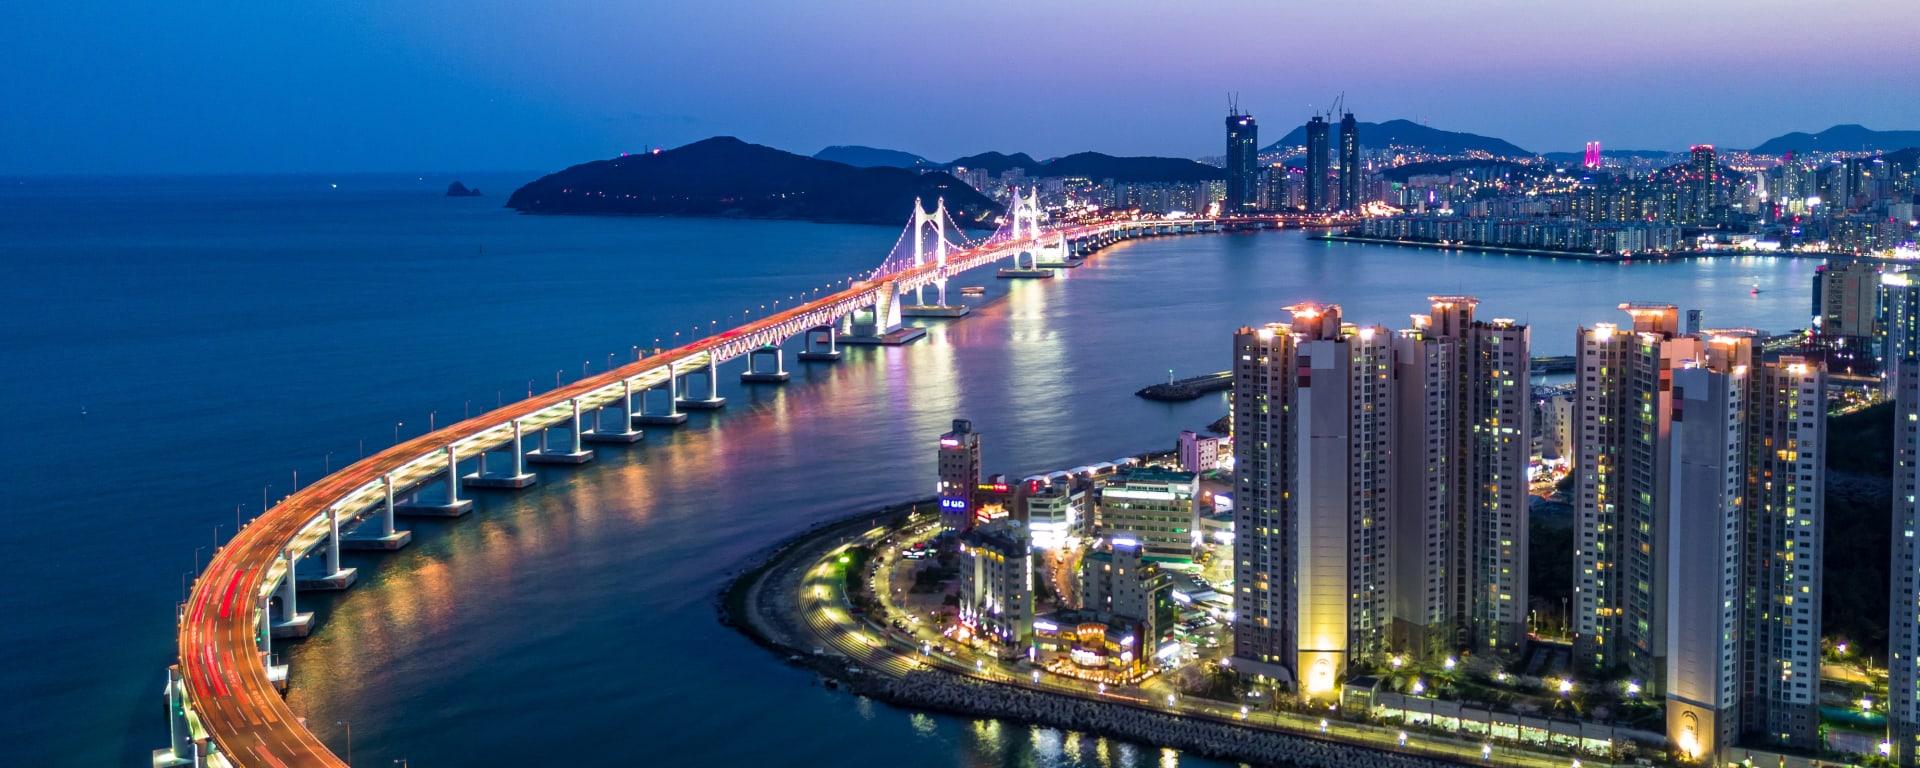 Südkorea entdecken mit Tischler Reisen: Korea Busan Skyline Gwangan Bruecke